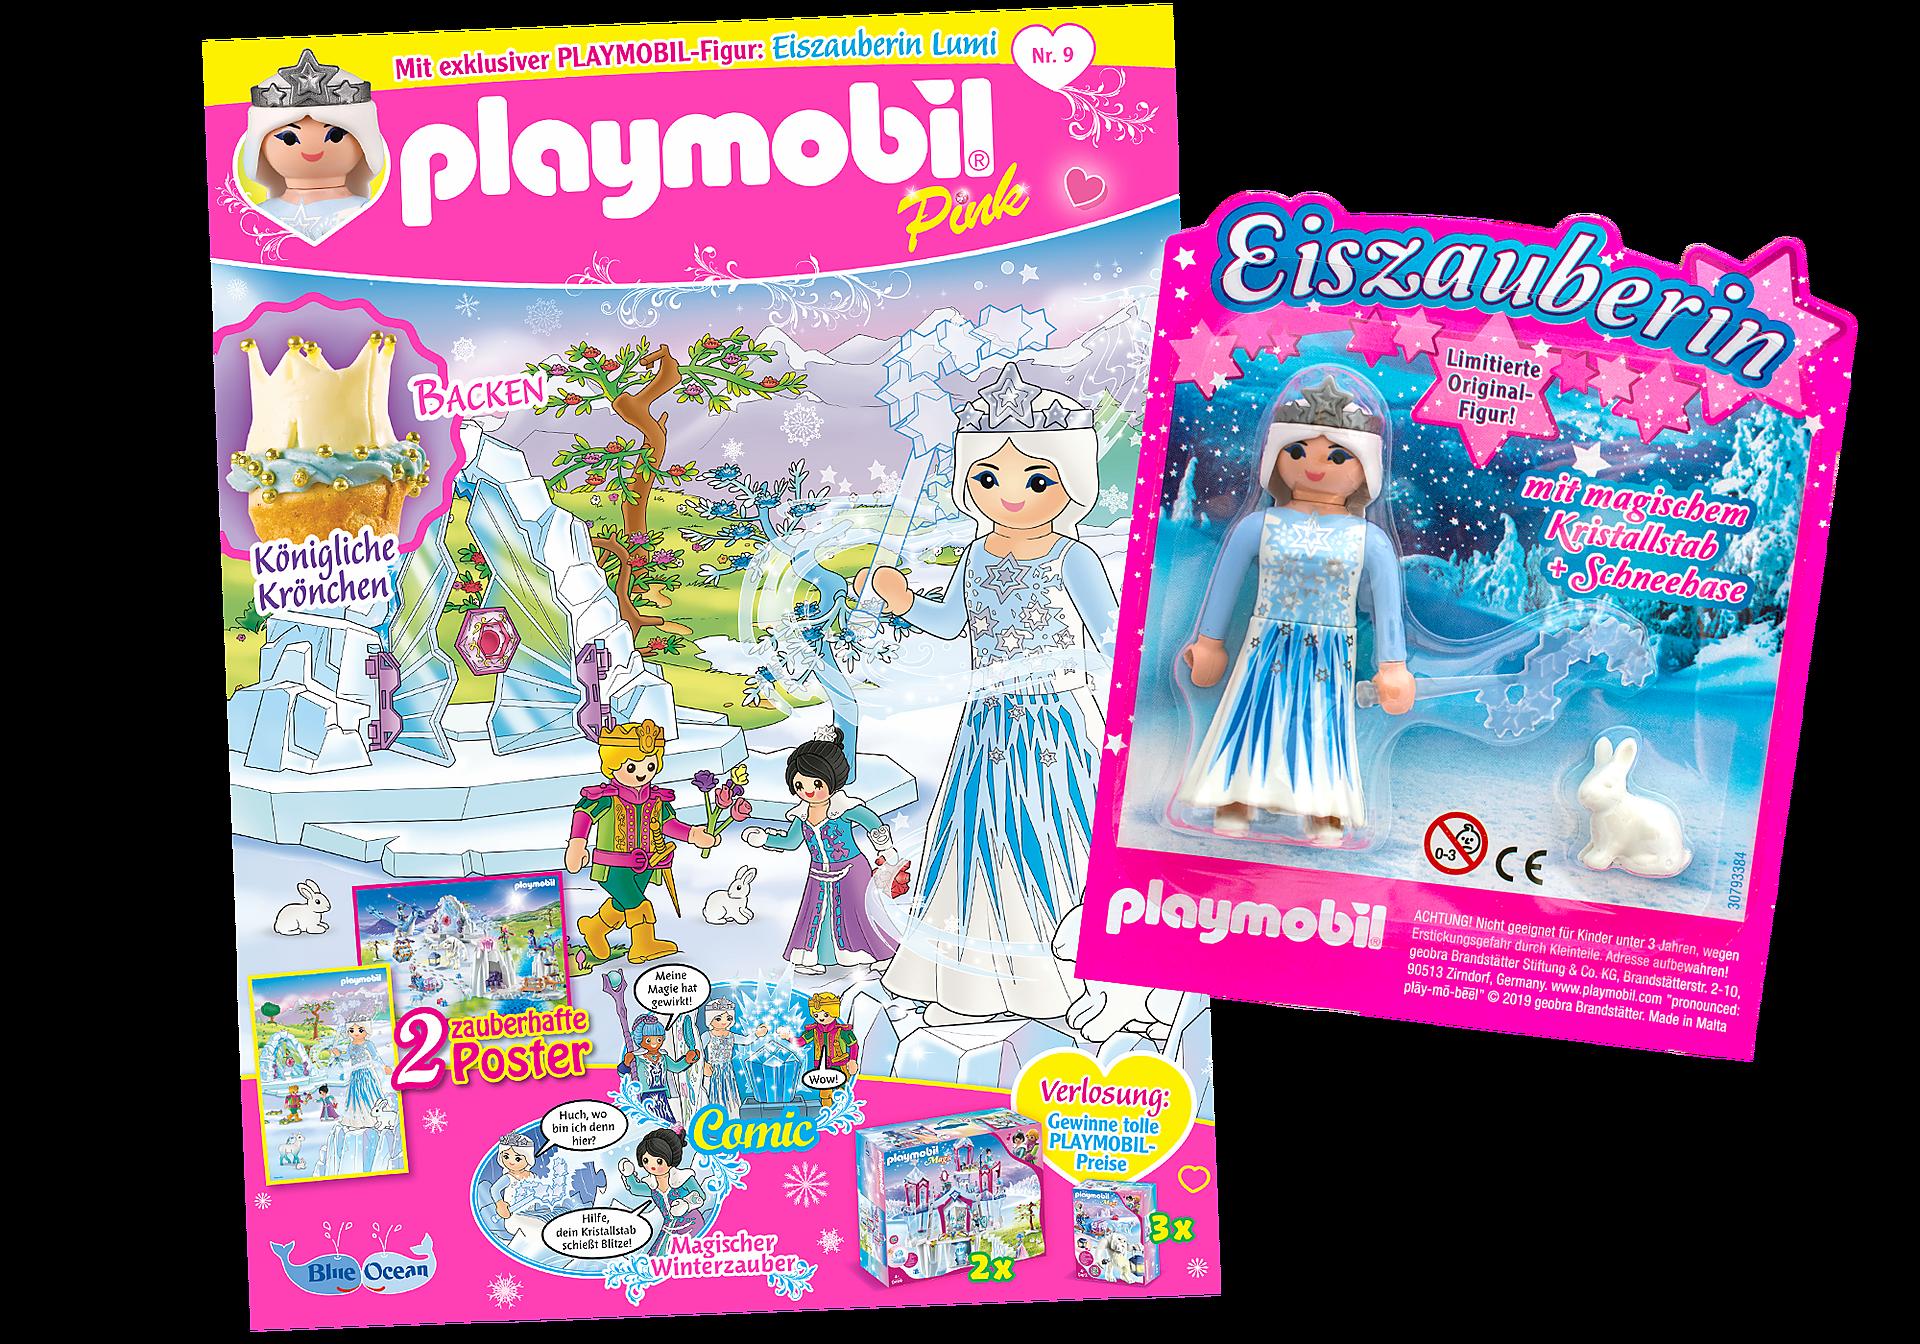 80639 PLAYMOBIL-Magazin Pink 9/2019 (Heft 49) zoom image1